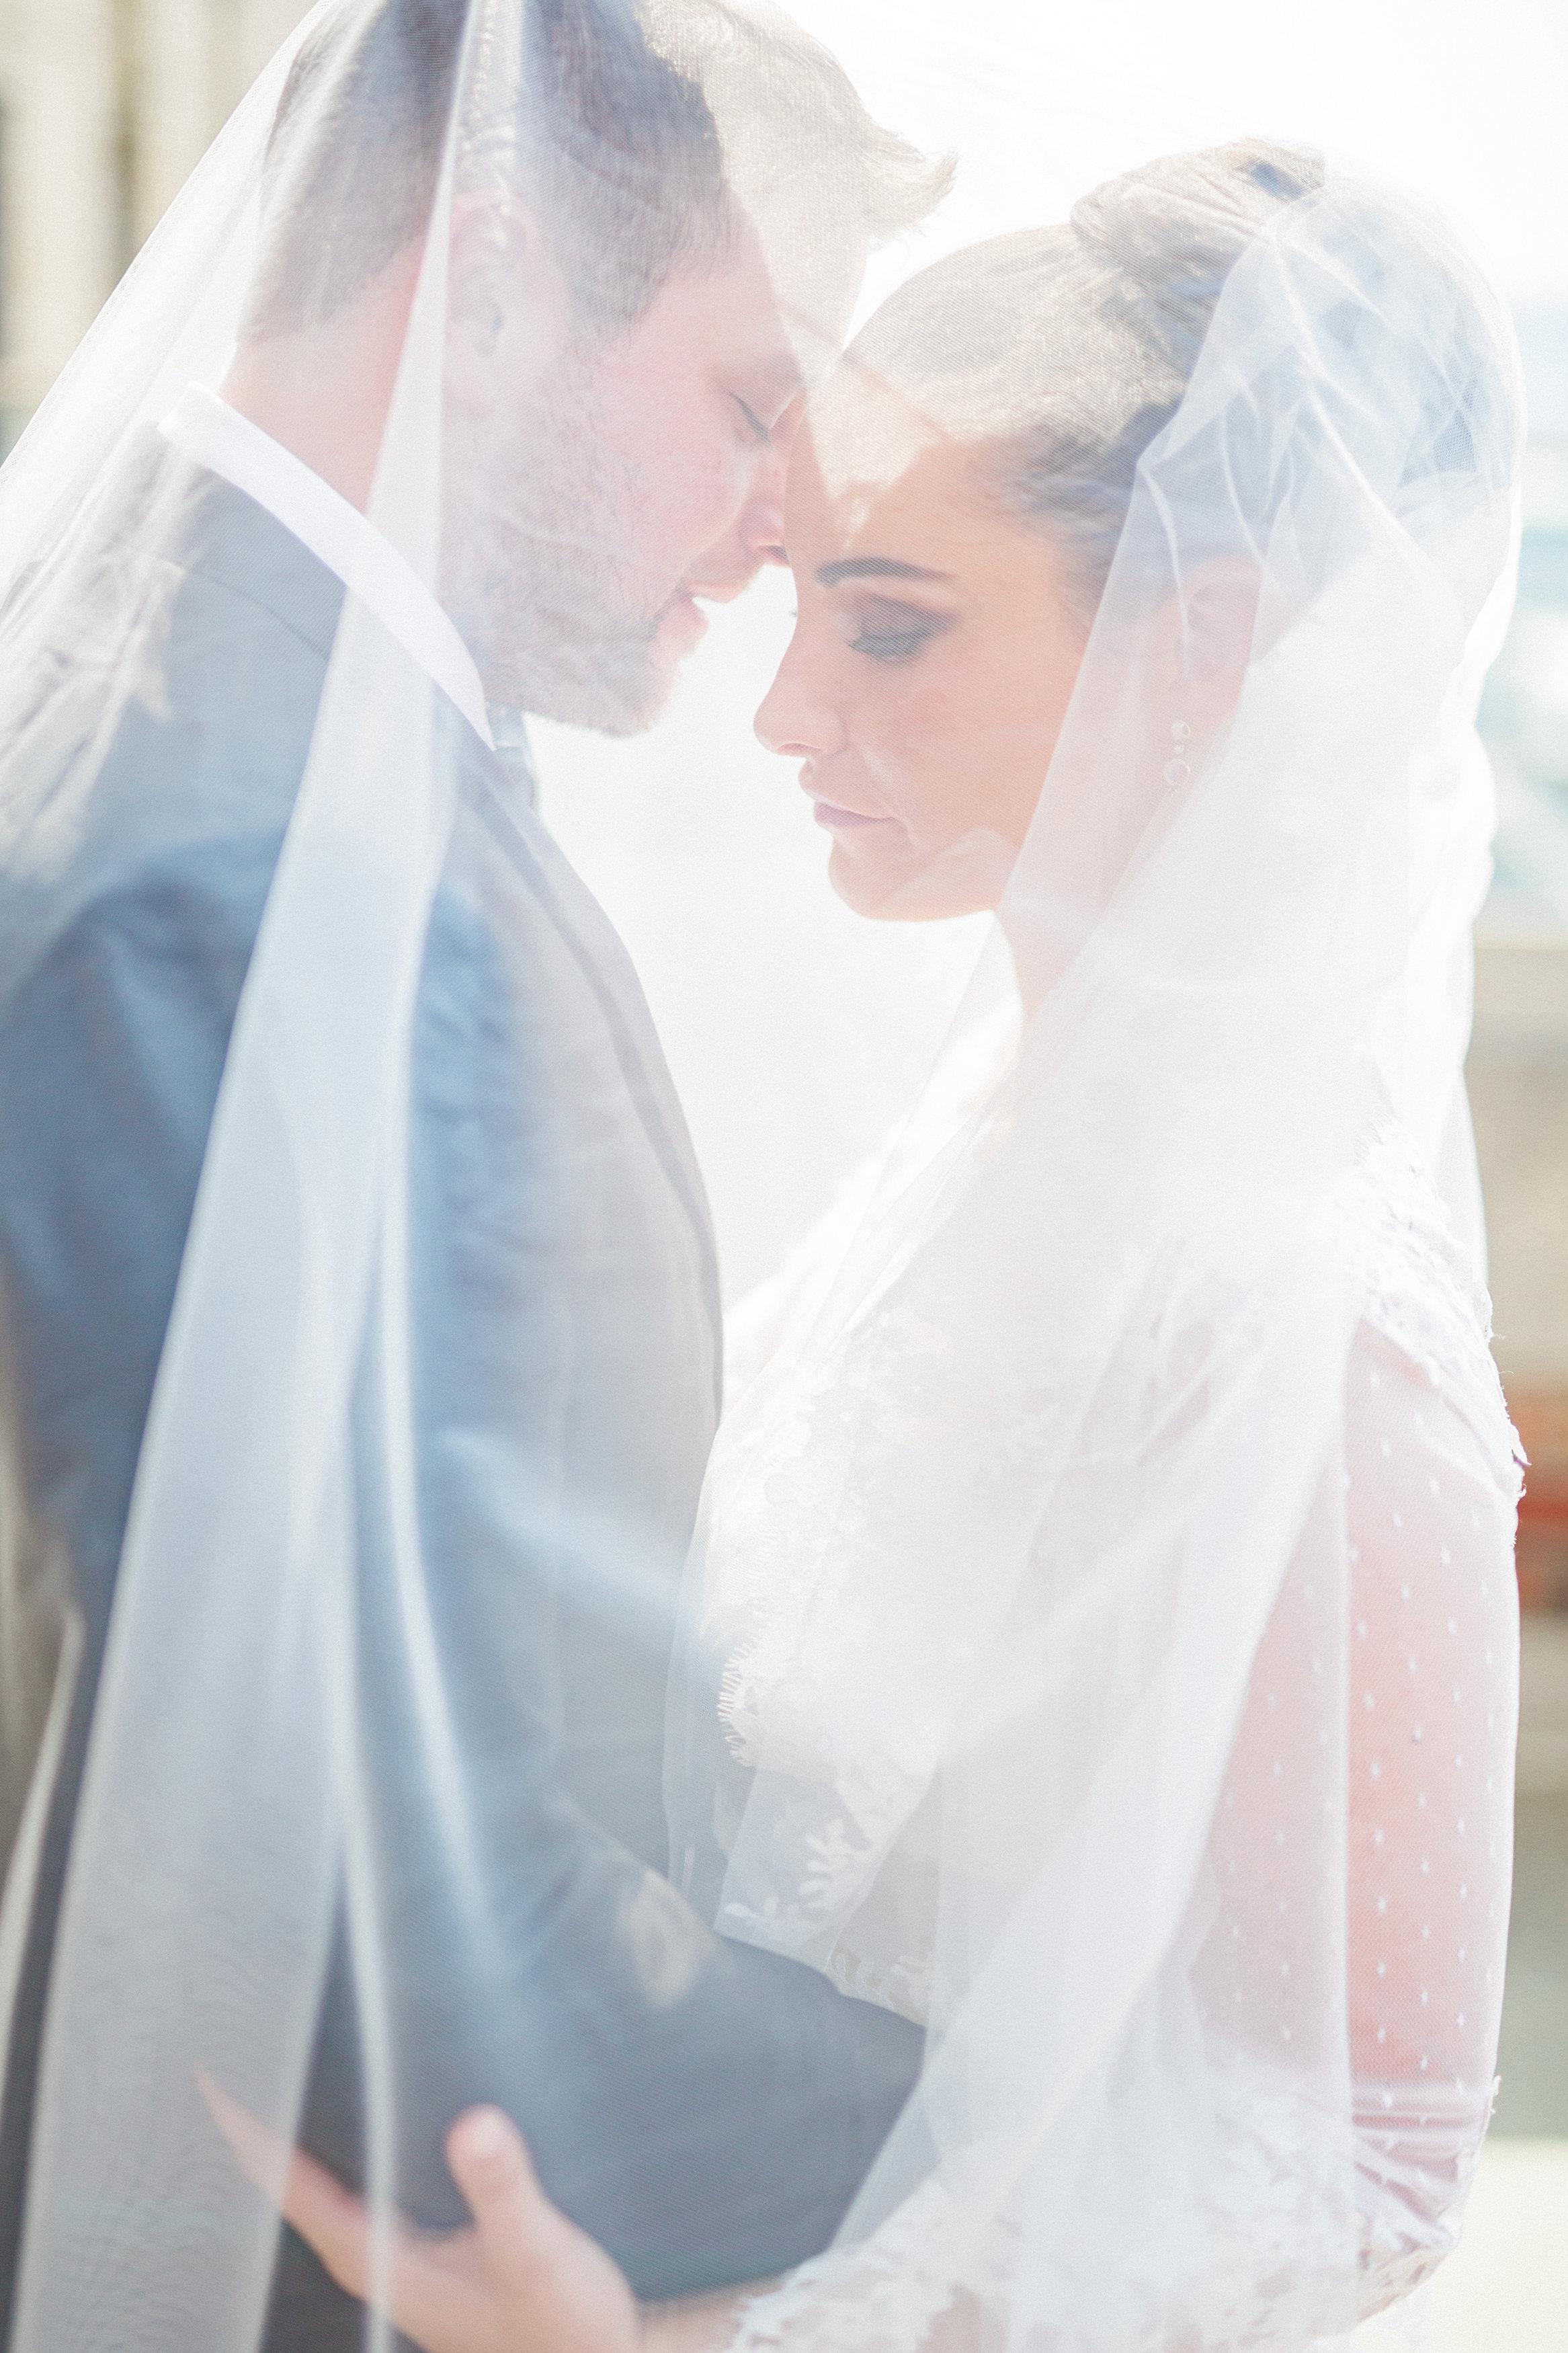 Bride and Groom shot at The Hilton Netherland Plaza Hotel Cincinnati, OH